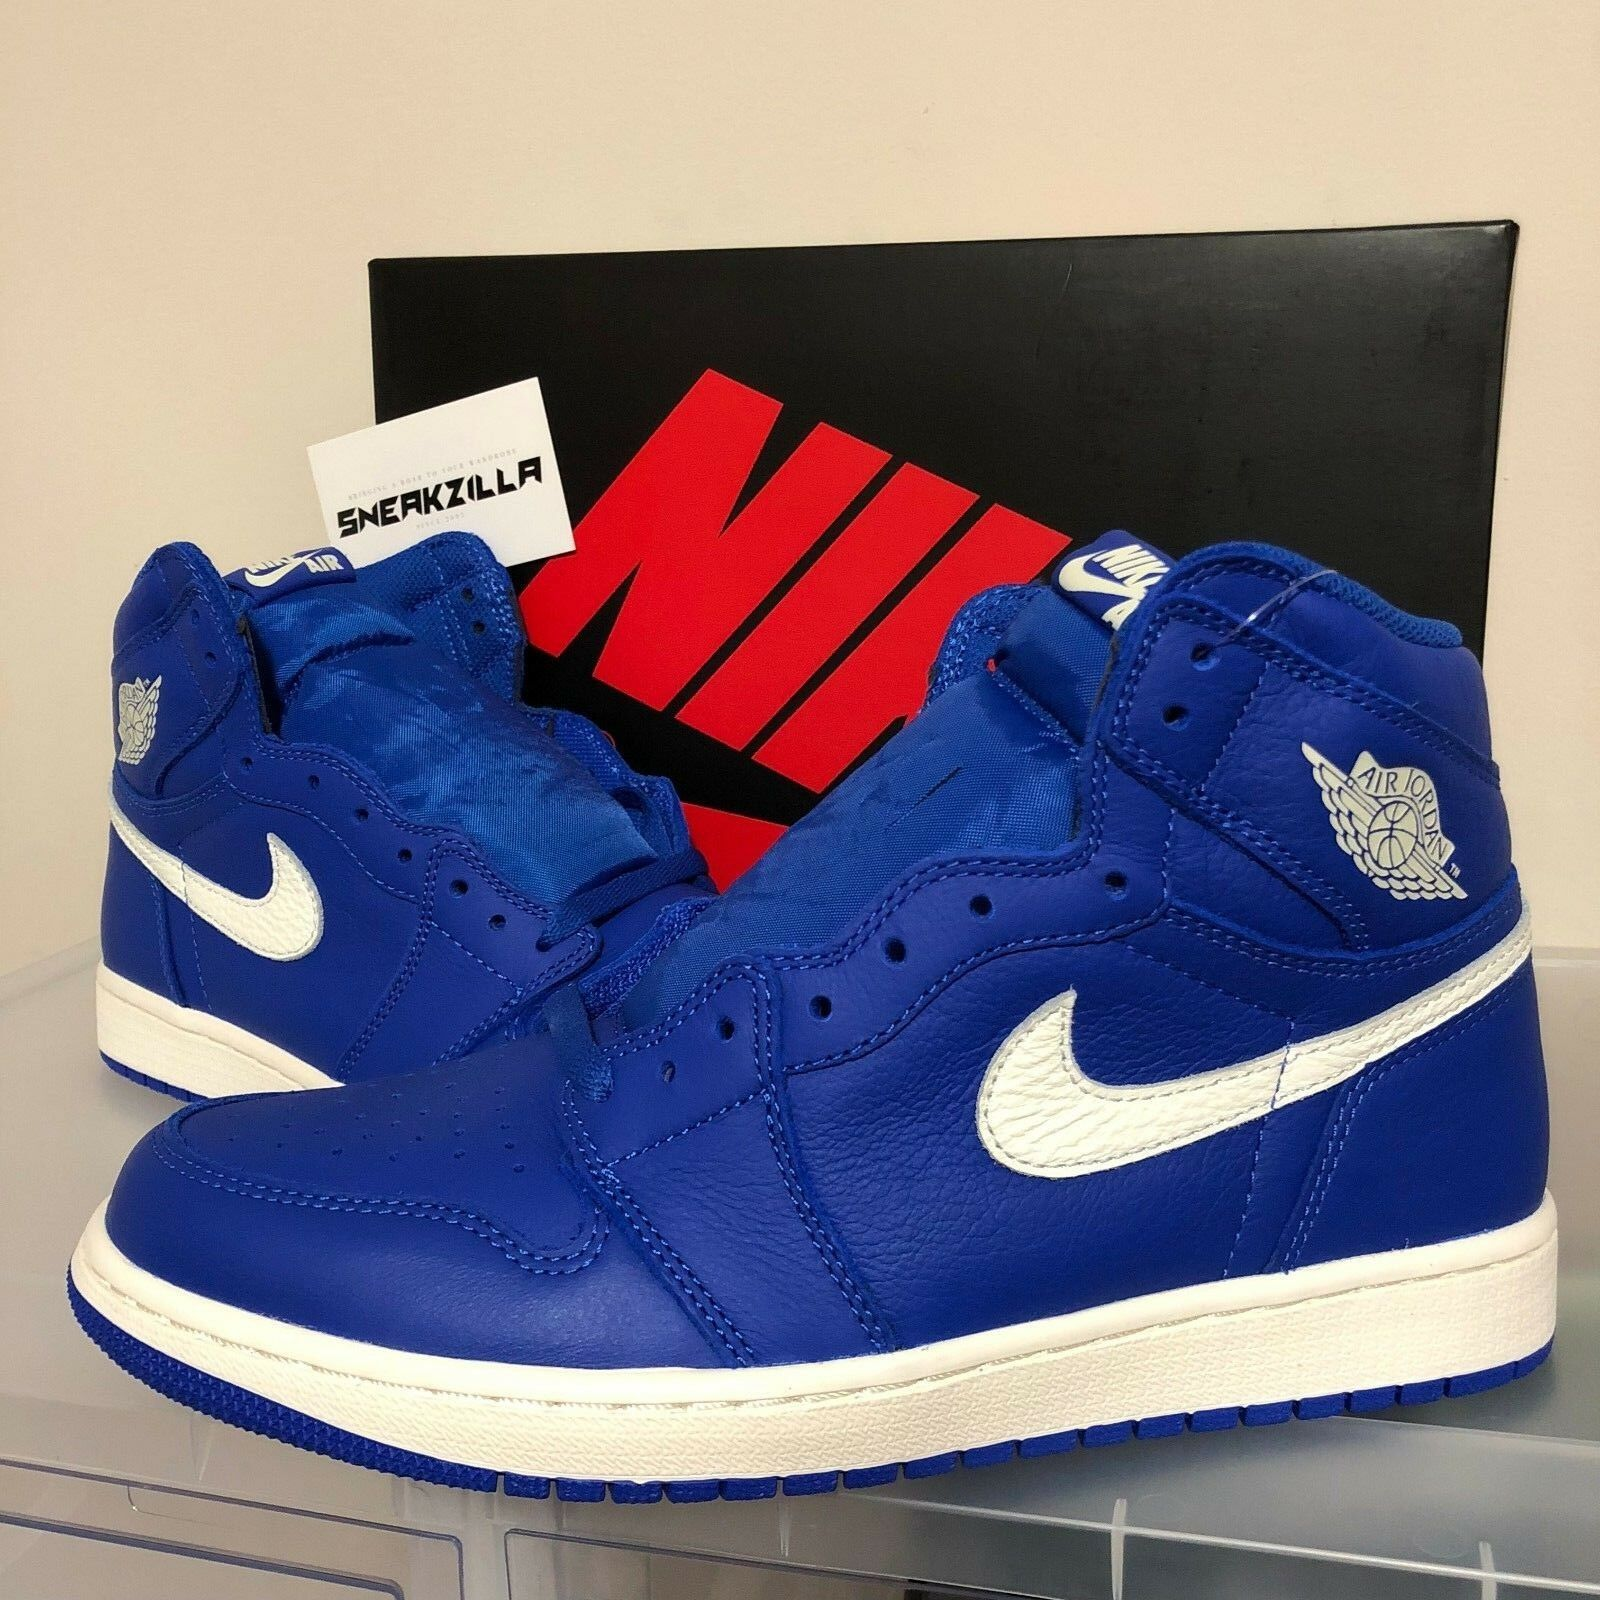 new style 6cece 2b600 ... france nike air jordan retro azul i 1 alta og hyper azul retro real  vela lote